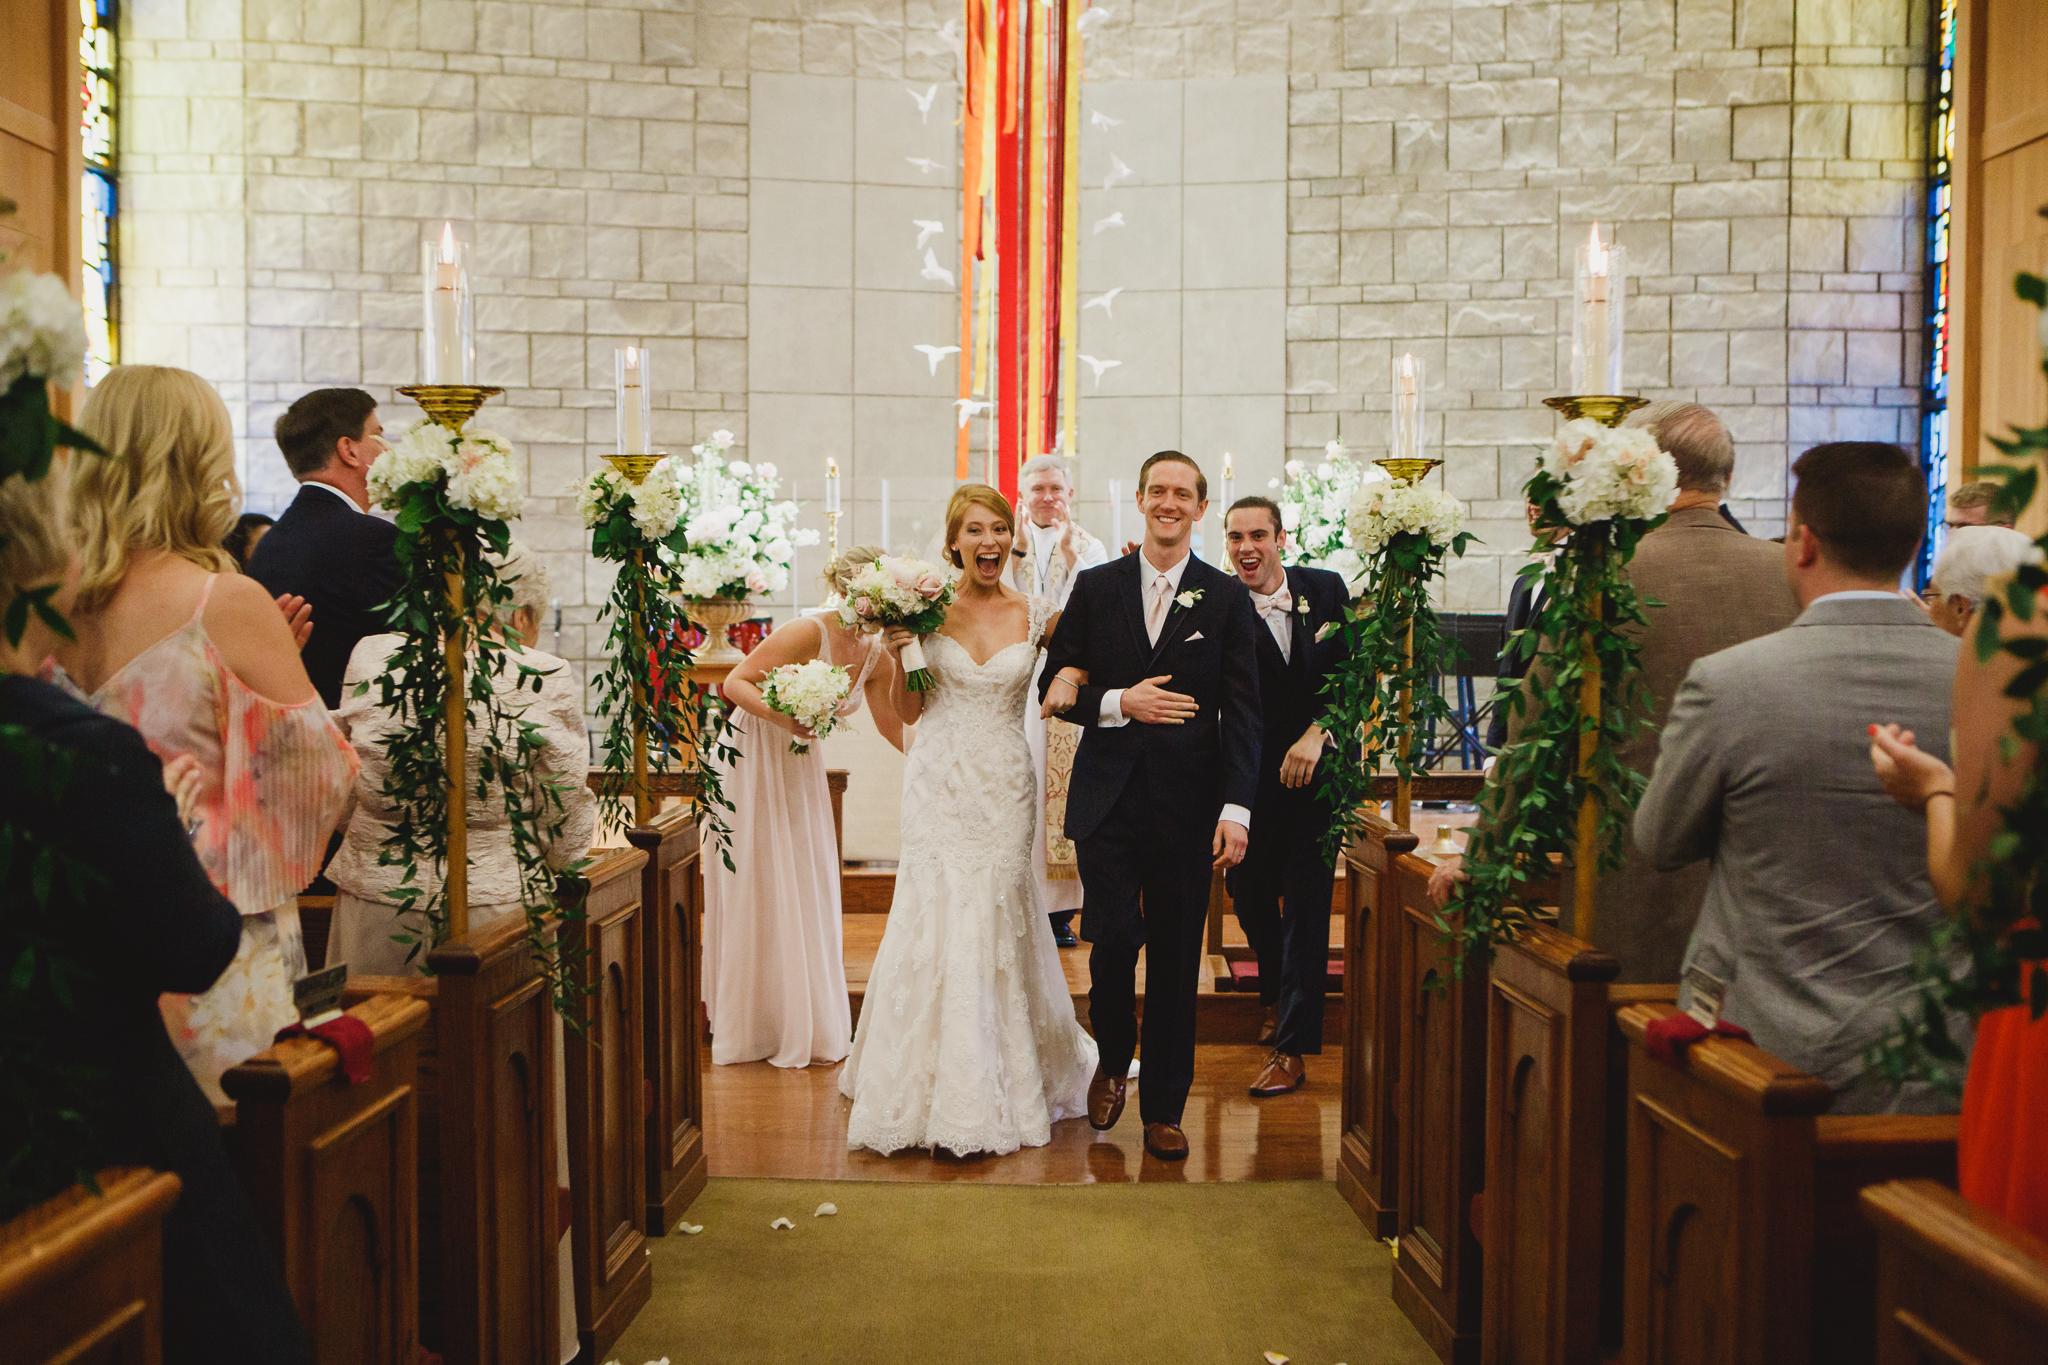 Michael and Kelly - the ashton depot - wedding DFW - wedding photographer- elizalde photography (56 of 150).jpg